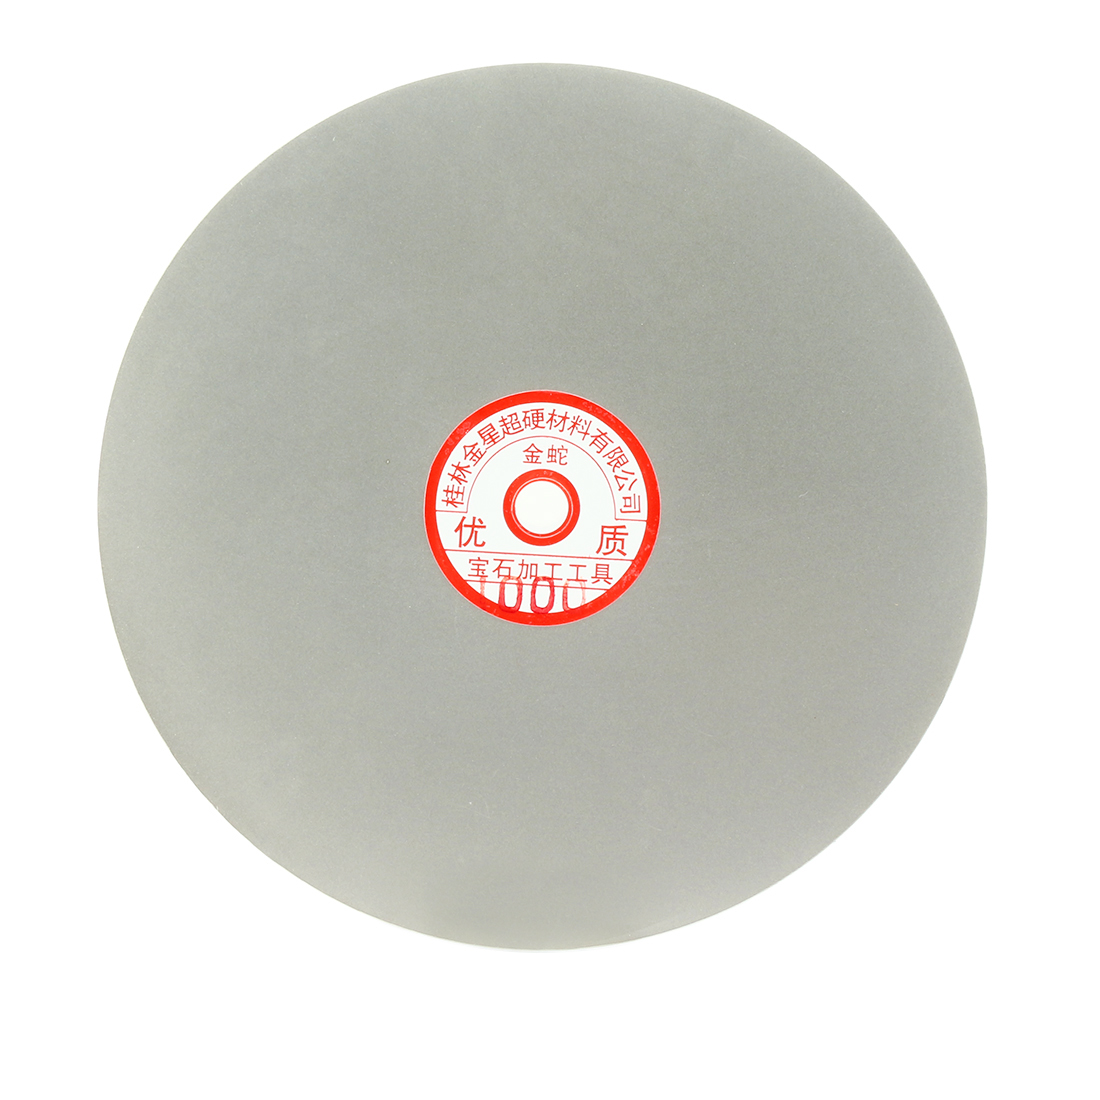 200mm 8-inch Grit 1000 Diamond Coated Flat Lap Disk Wheel Grinding Sanding Disc